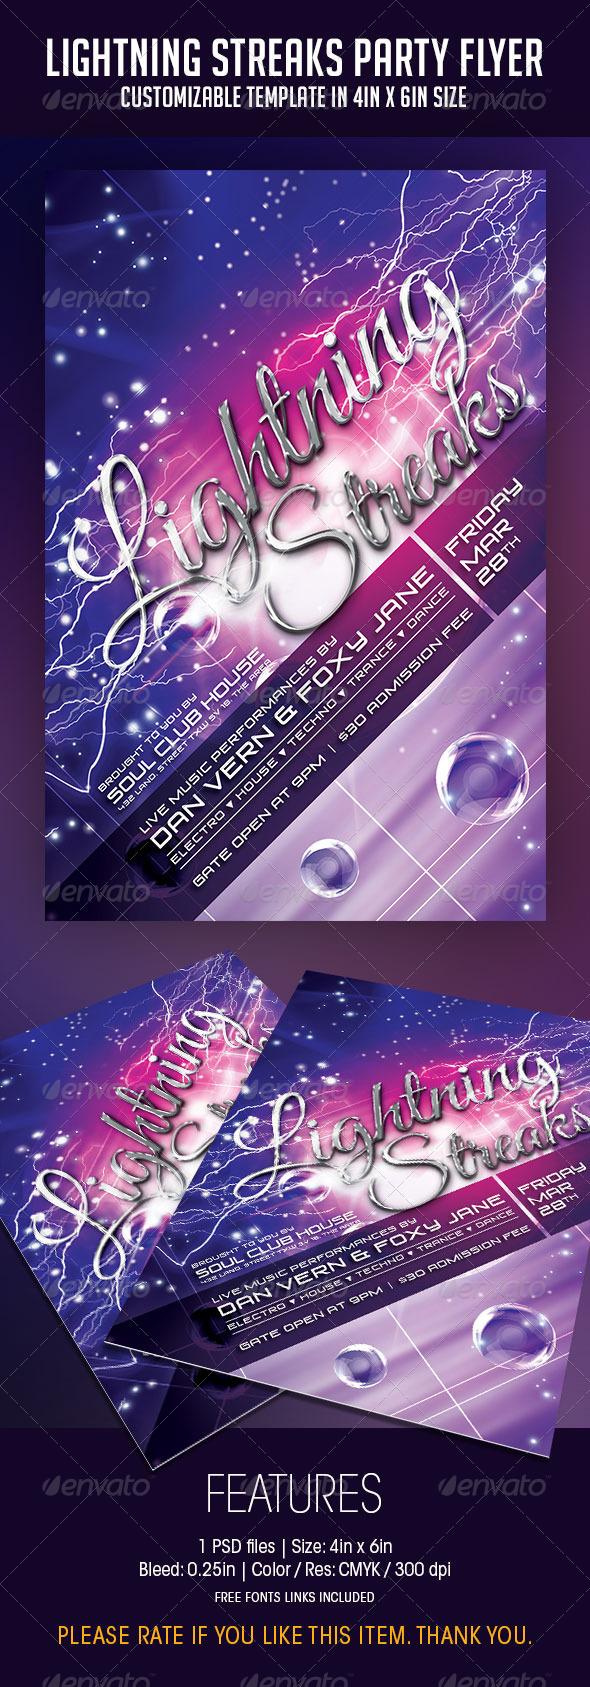 lightning link template - print template graphicriver lightning streaks party